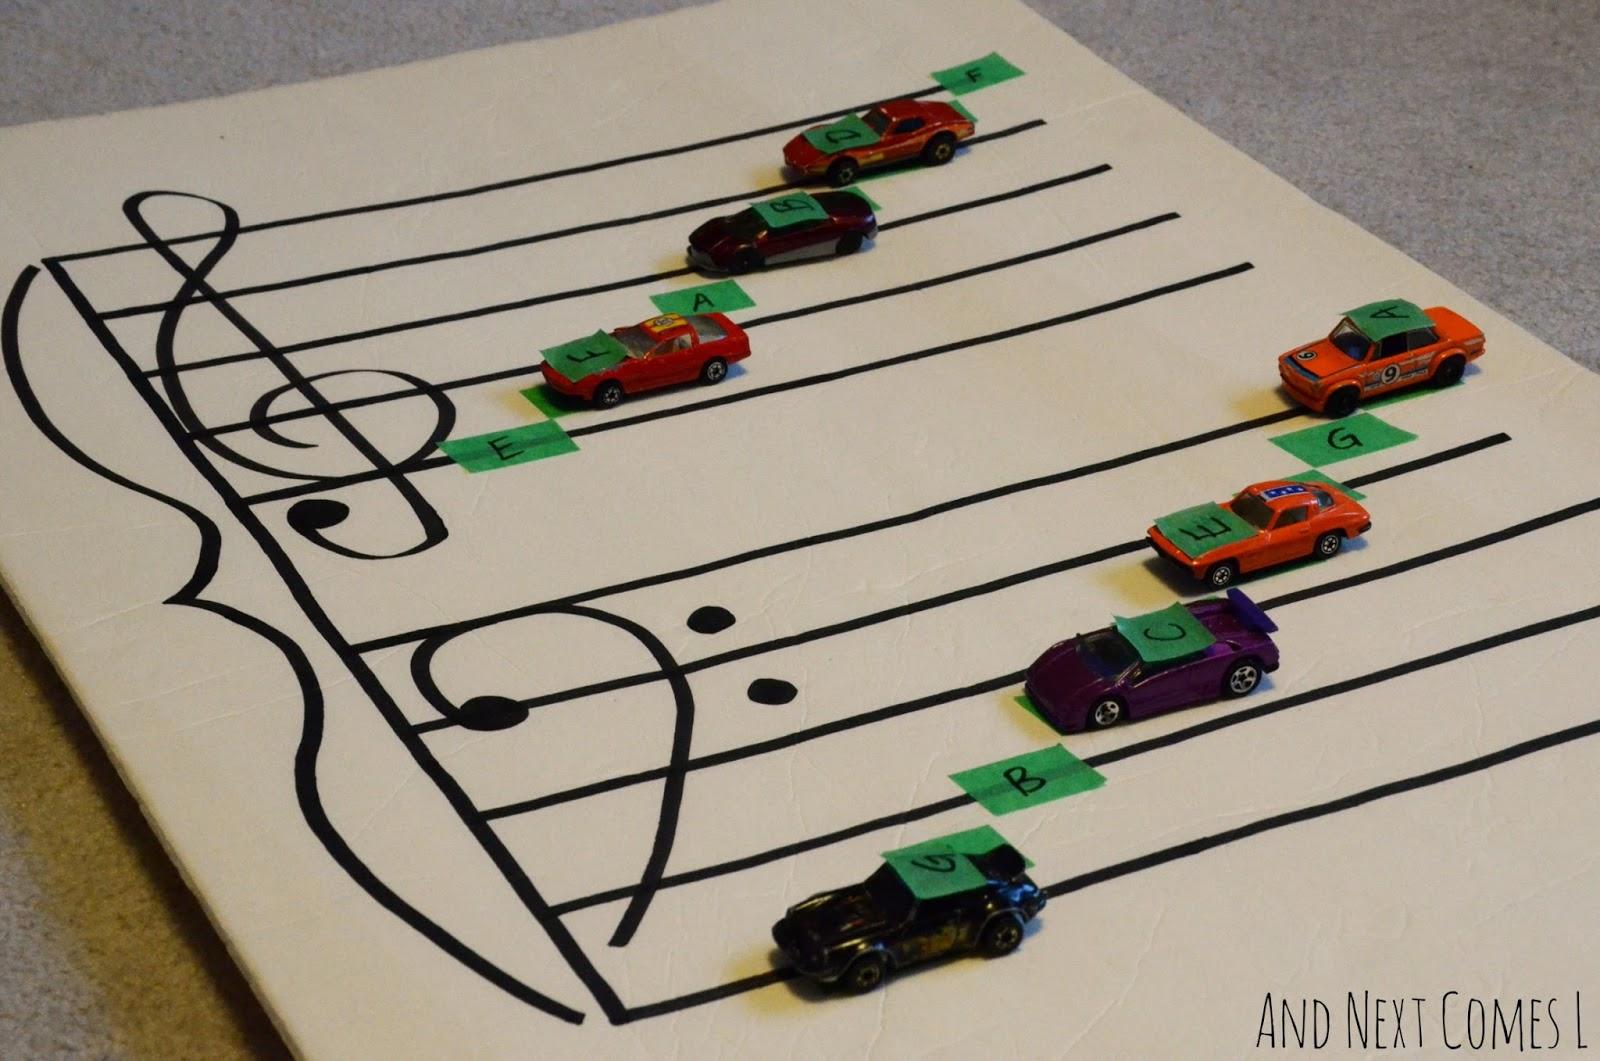 Teach children music theory